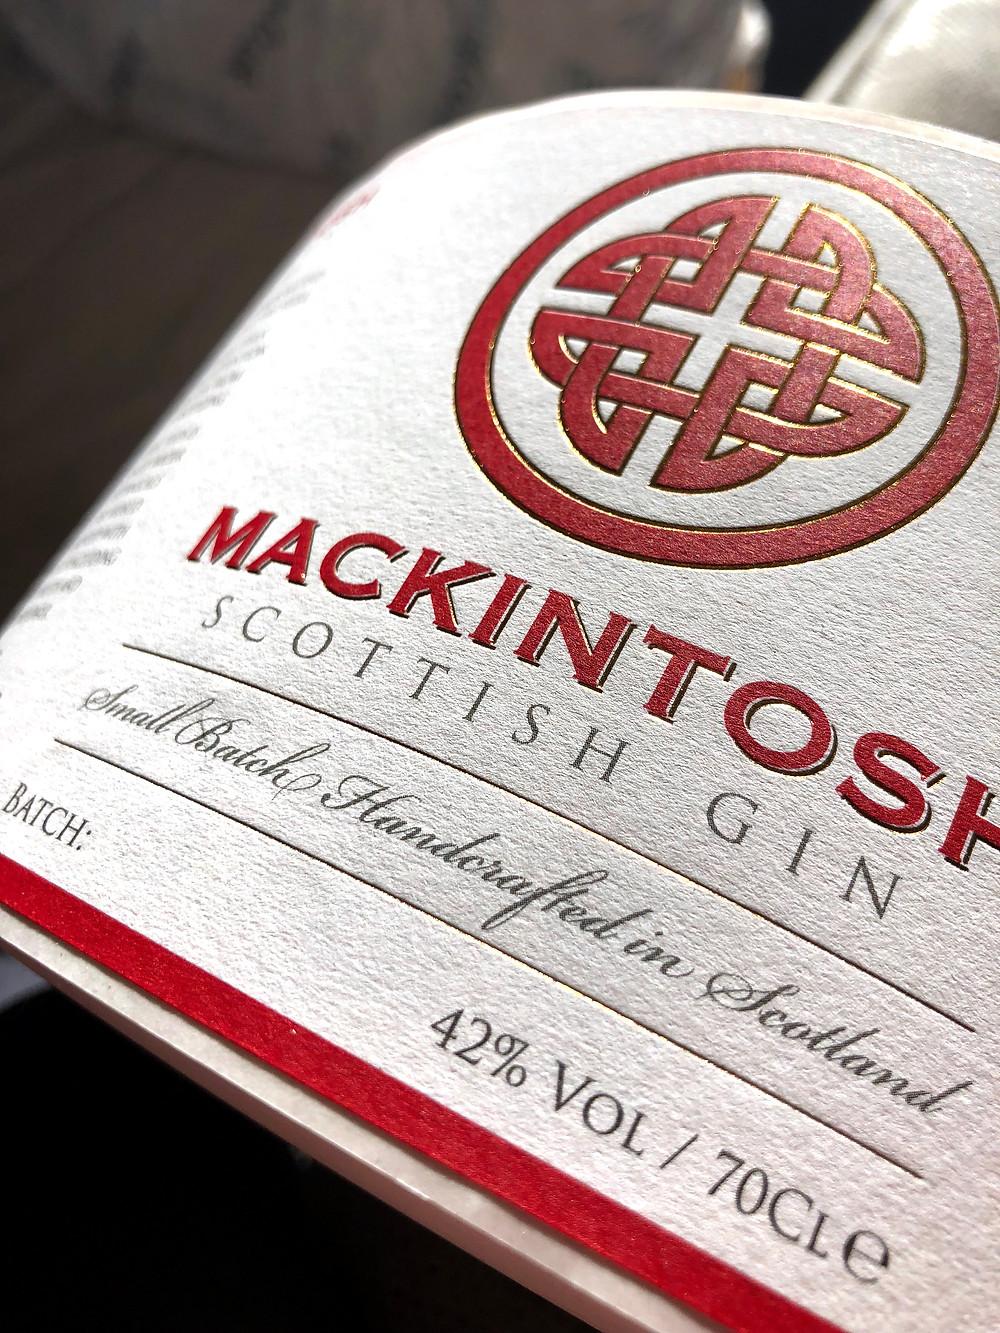 Mackintosh Gin Label showing Mackintosh Scottish Gin on the front